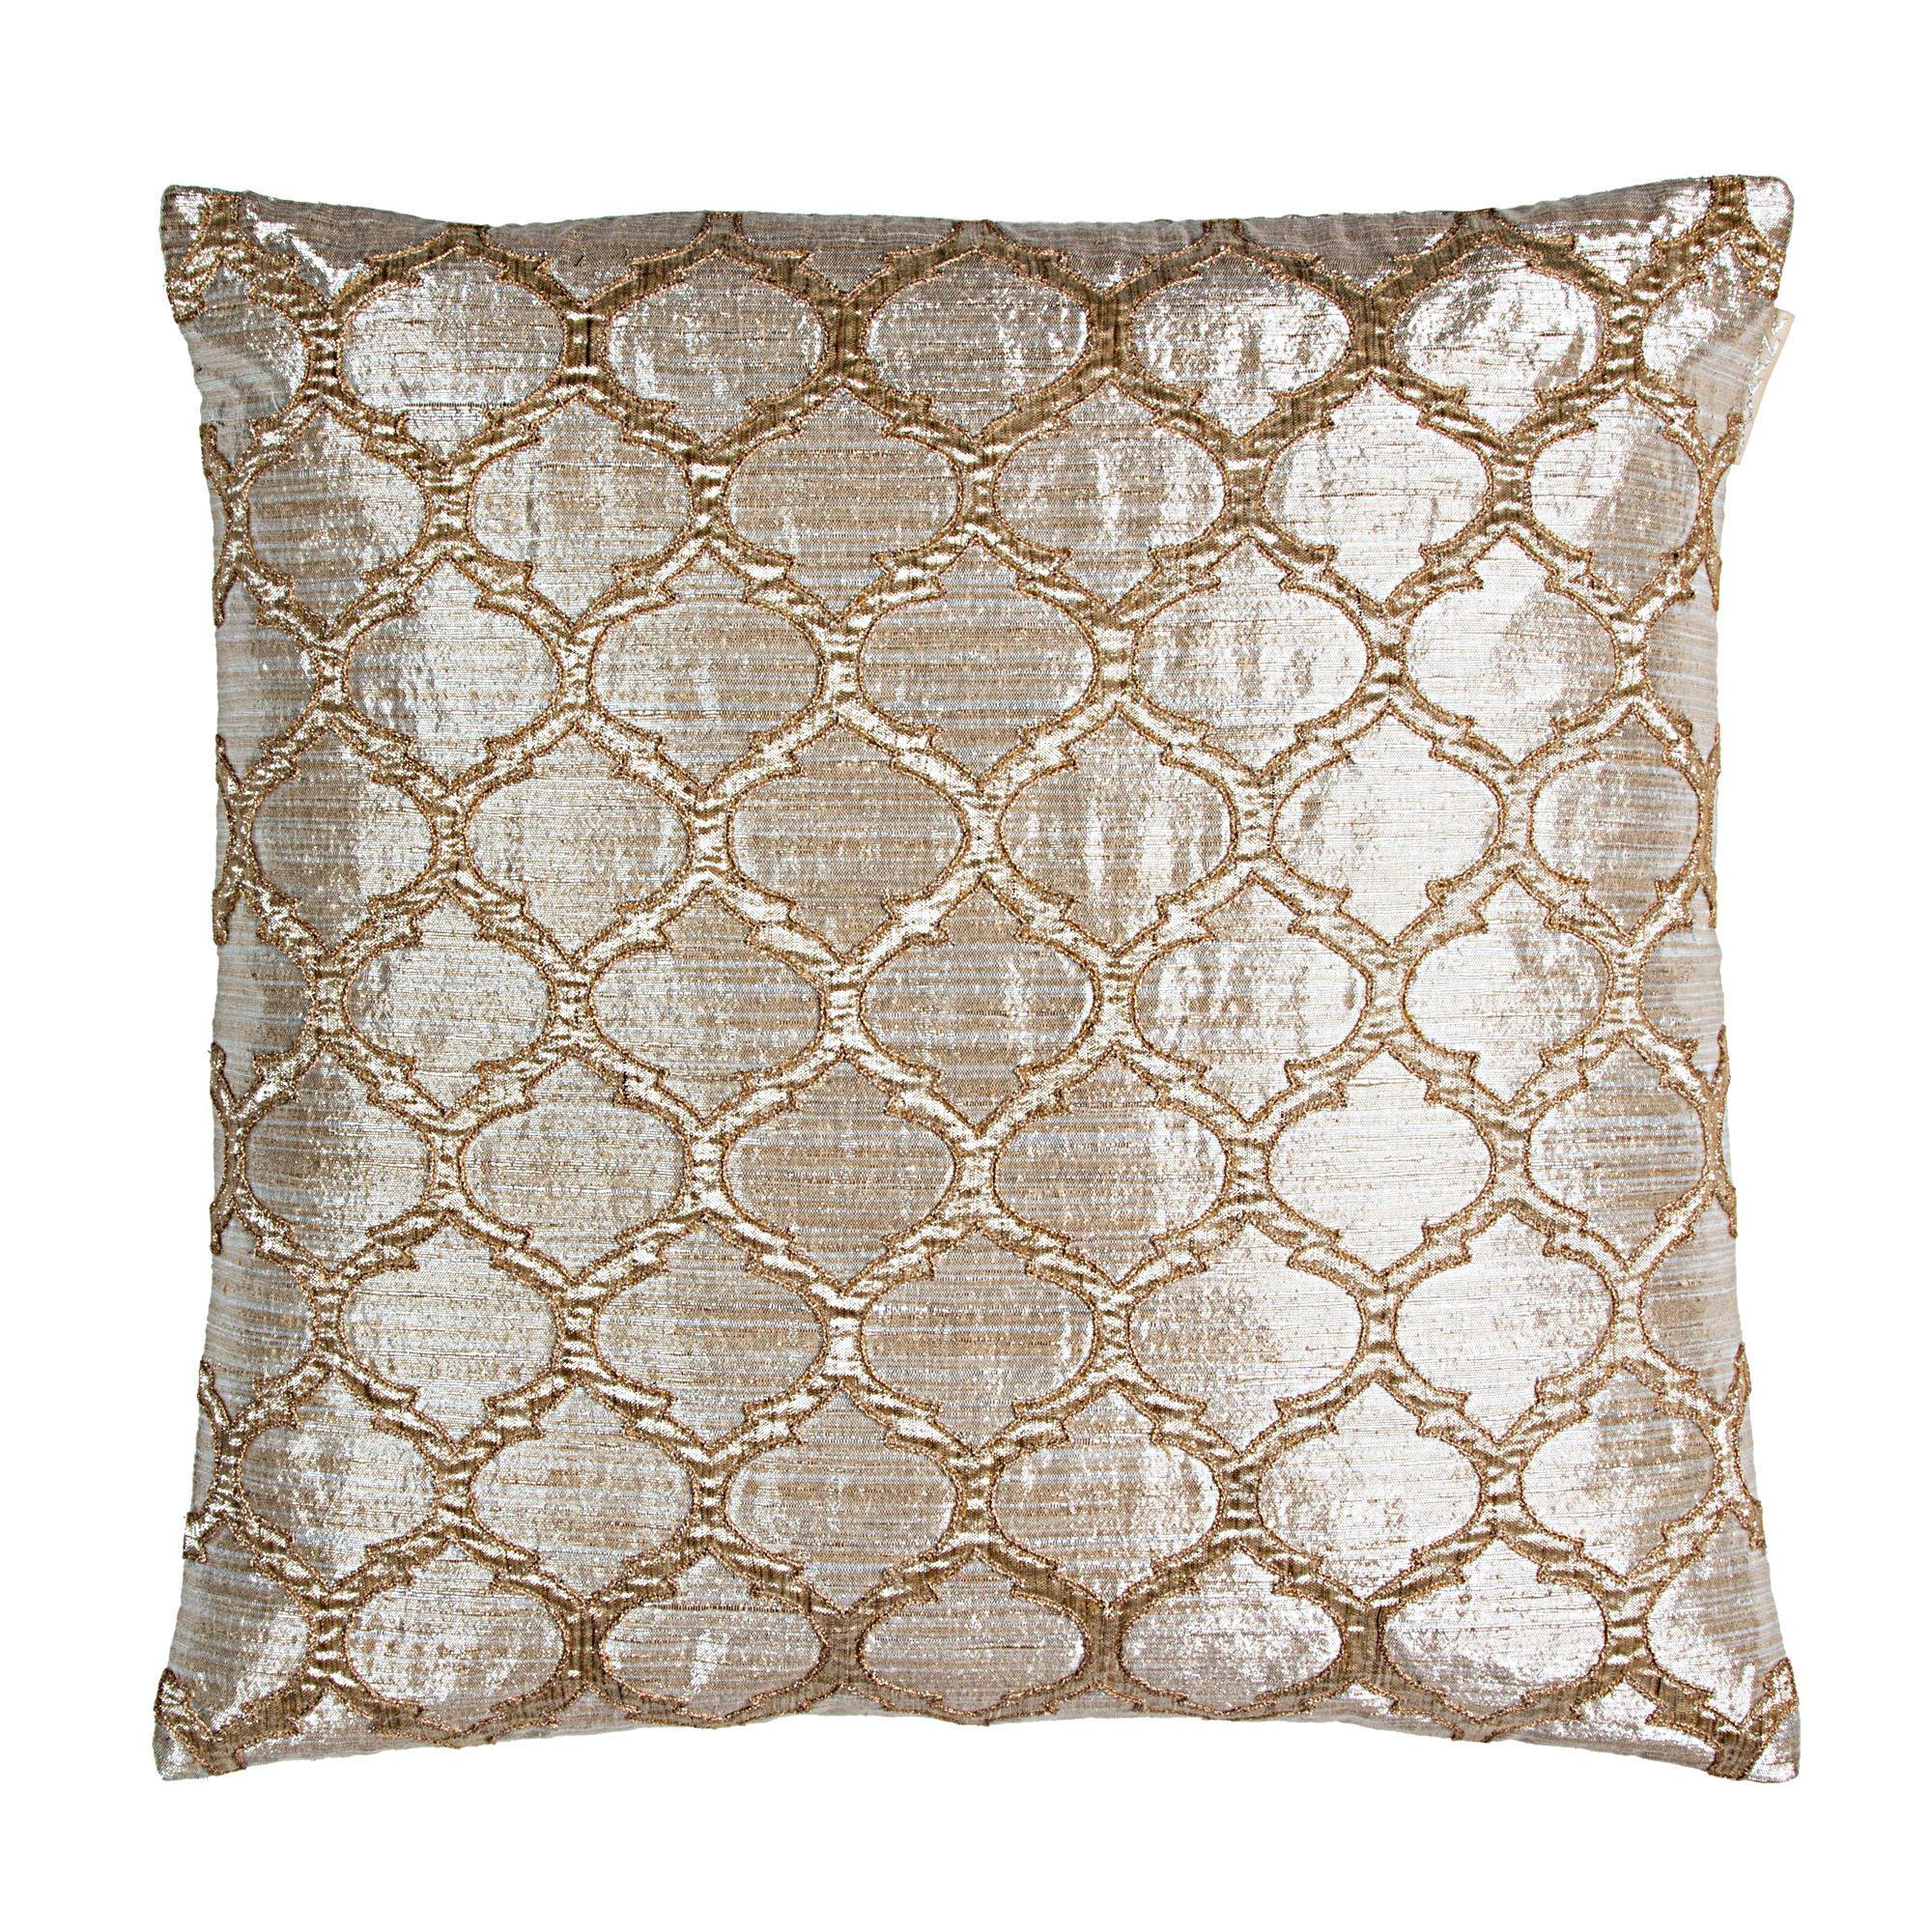 Sivaana Morocco Pathwork Silk Throw Pillow Wayfair